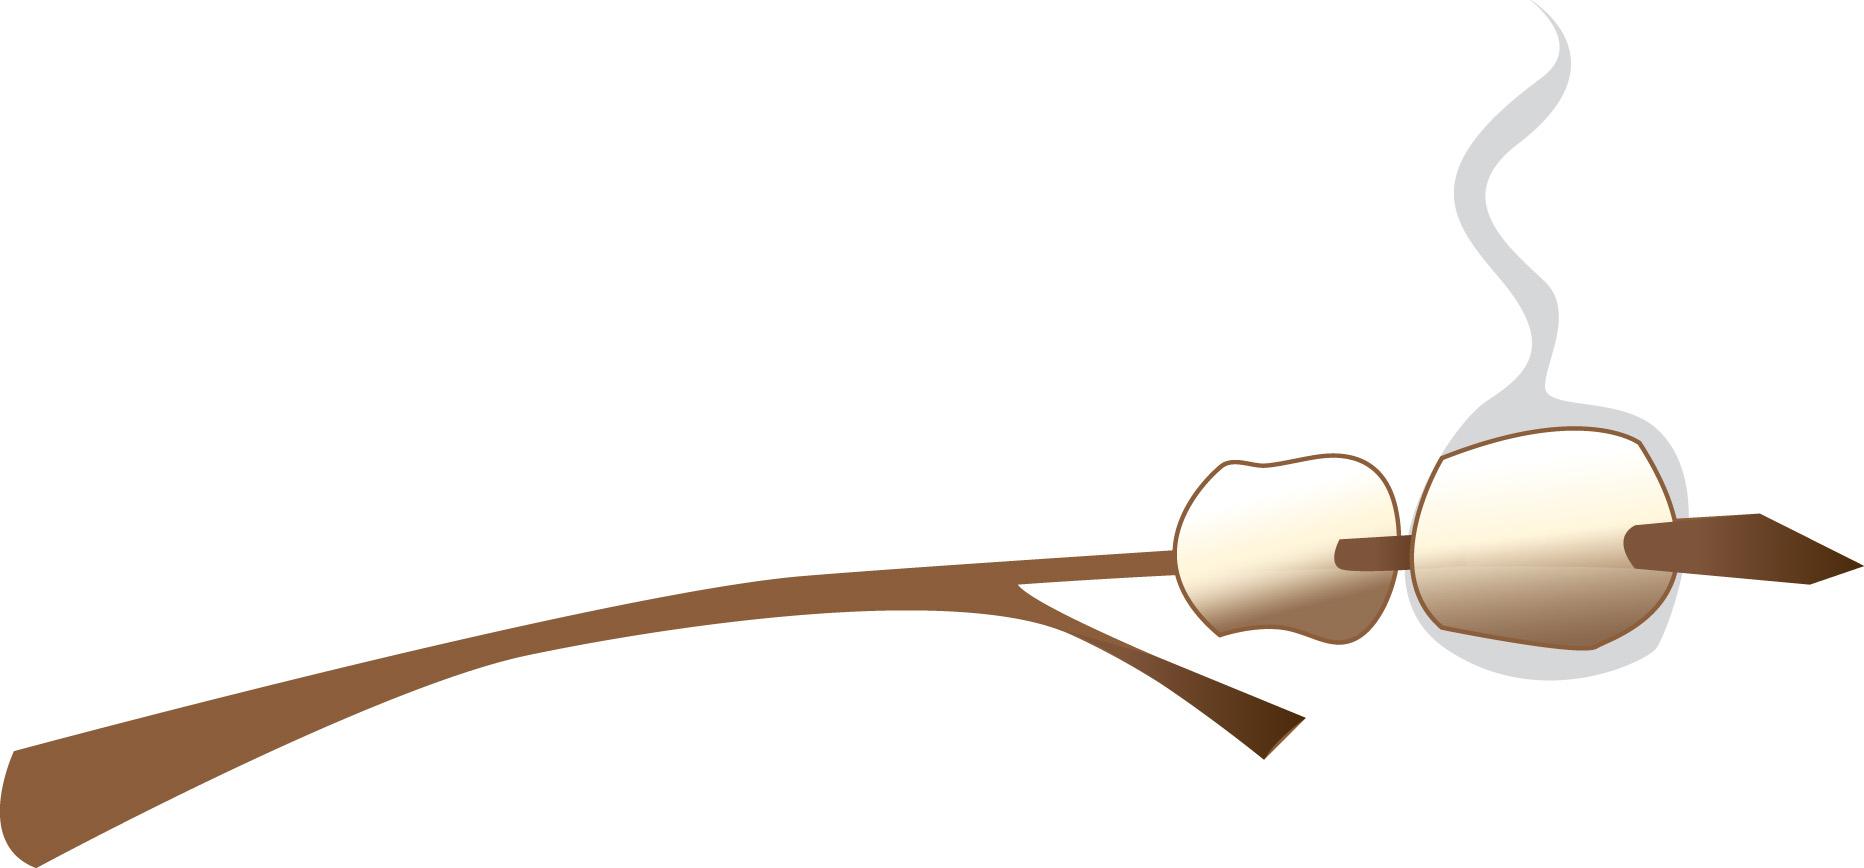 Roast clipart roasting marshmallow Art Clip Images Clip Marshmallow